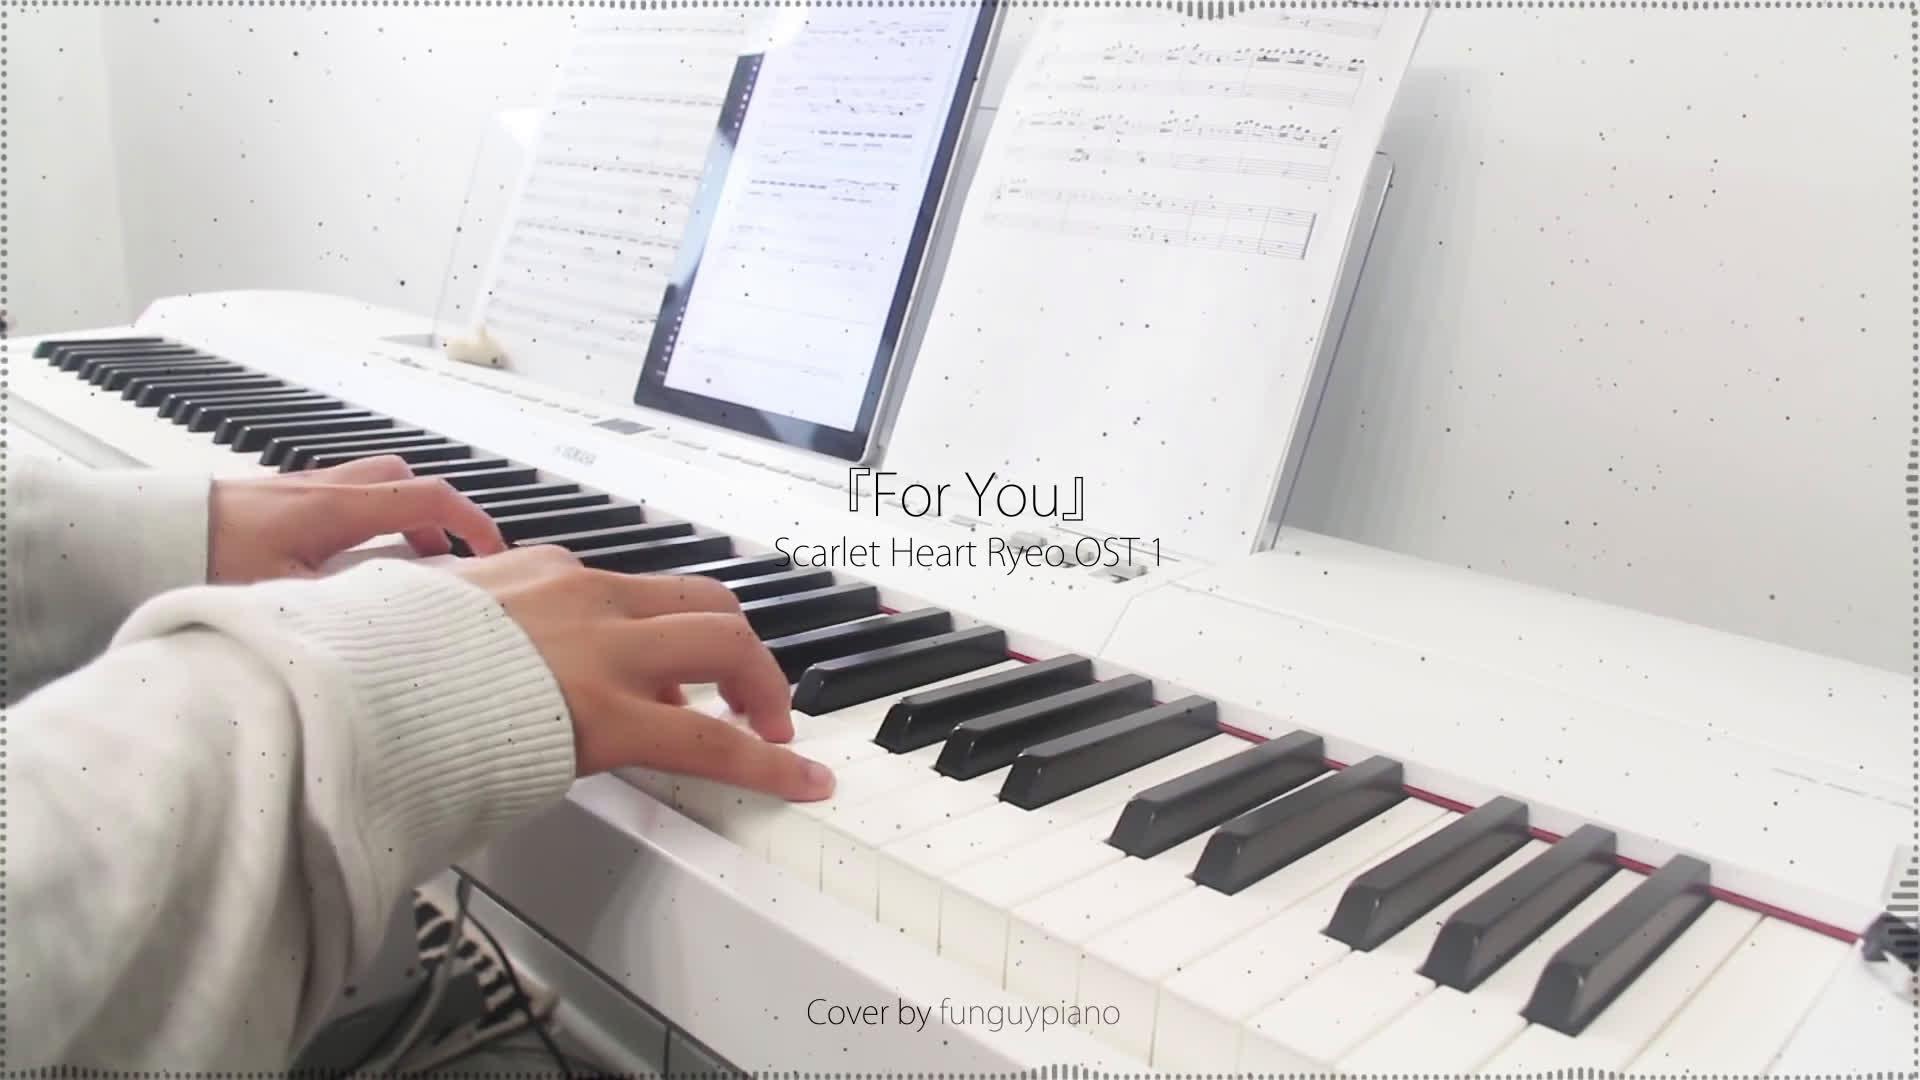 月之恋人-步步惊心:丽 OST1 - (EXO) For You - 钢琴版